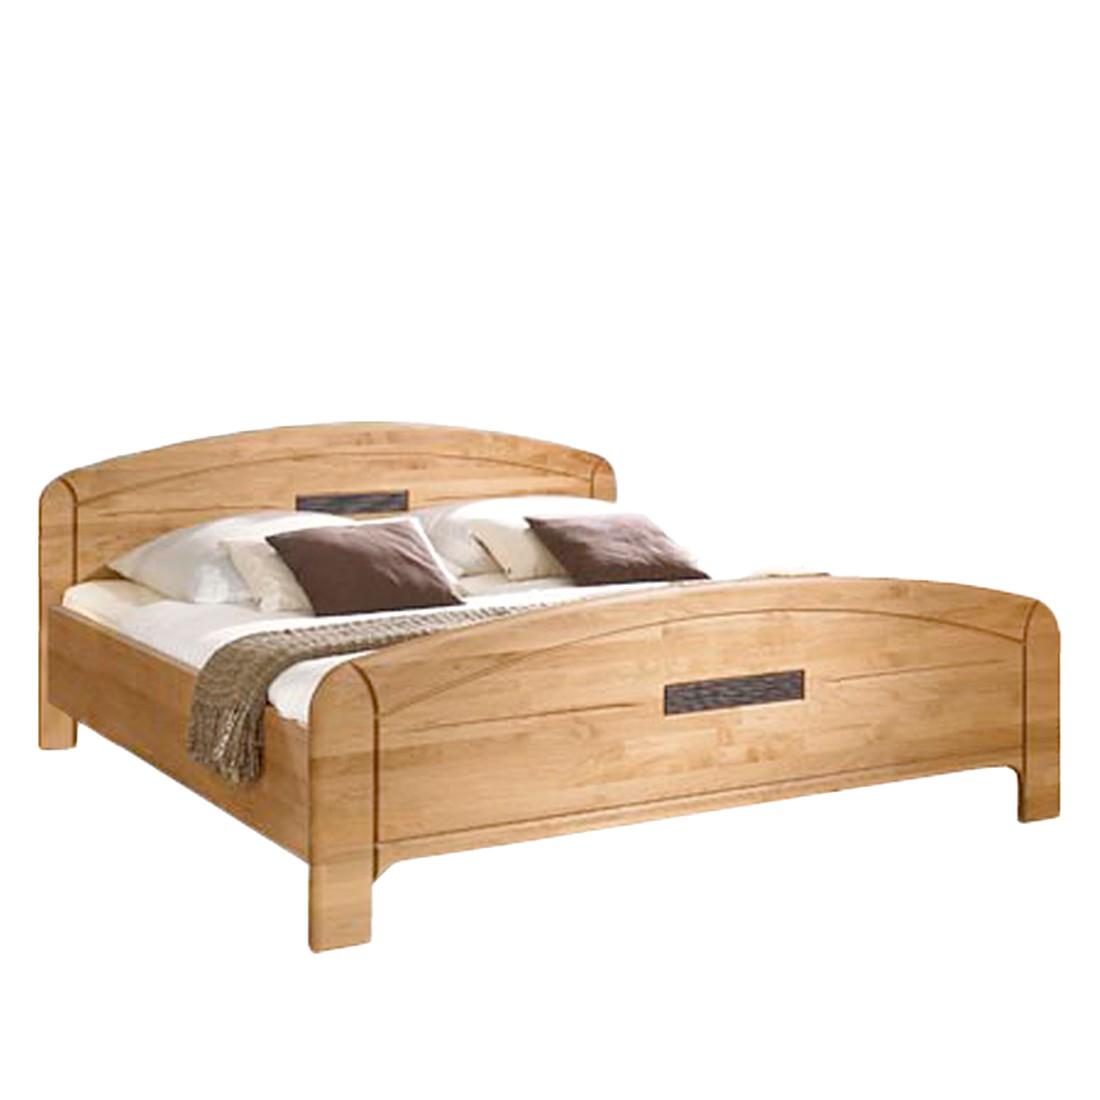 Holzbett Gloria – Erle teilmassiv lackiert/Braun – Liegefläche: Ü-Länge 200 x 210 cm, Franco Möbel kaufen